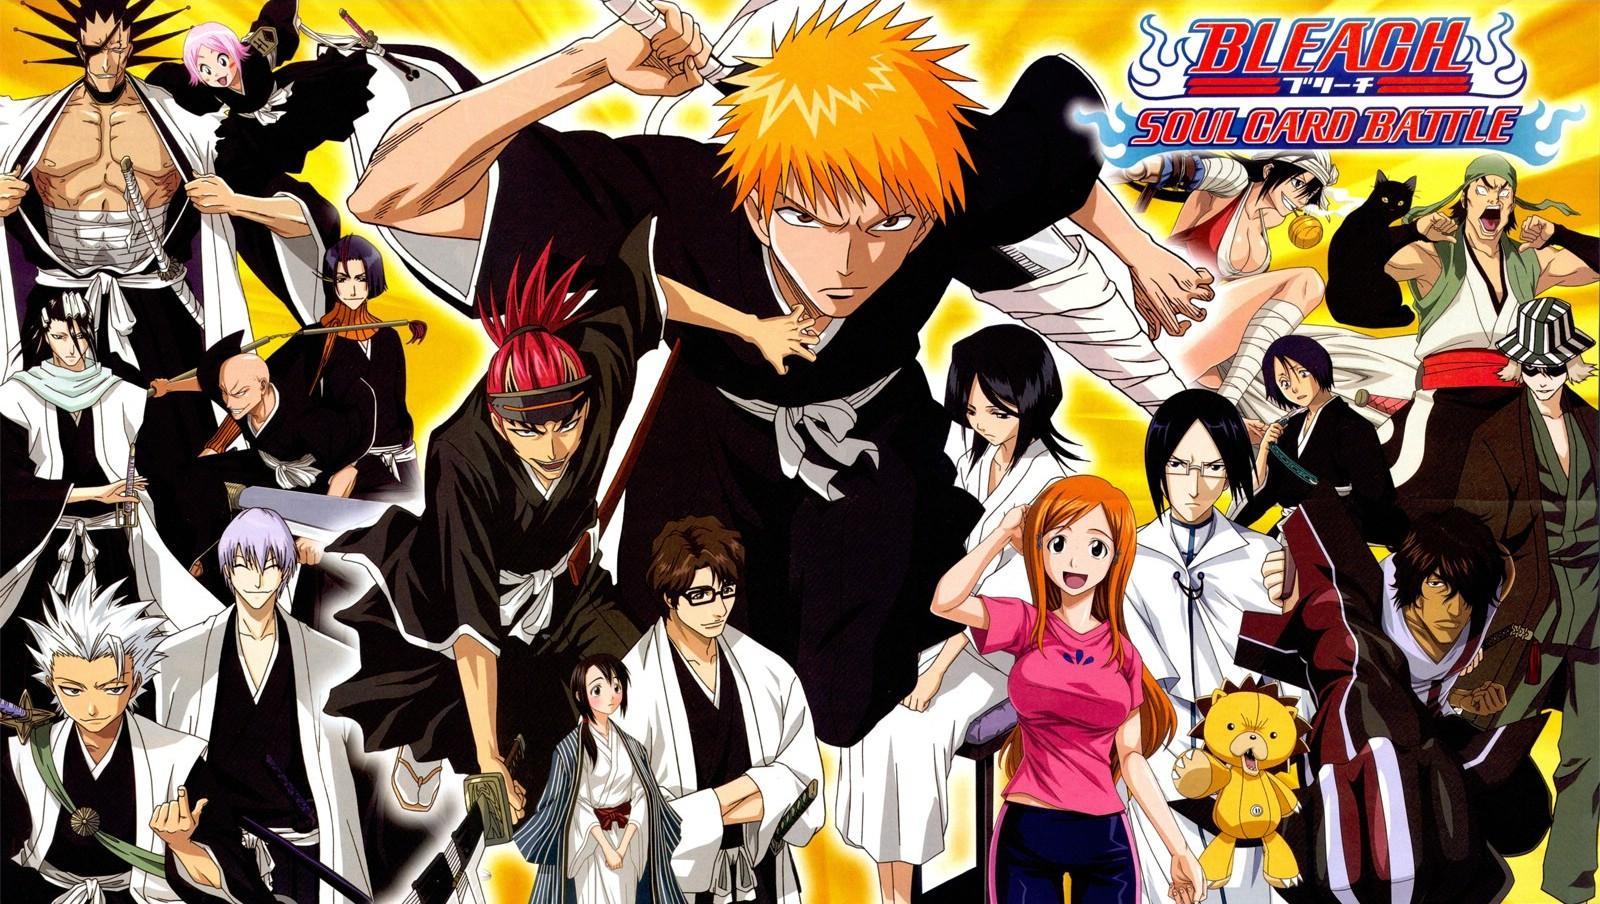 Anime 4k Wallpaper: Naruto And Bleach Anime Wallpapers: Bleach HD Anime